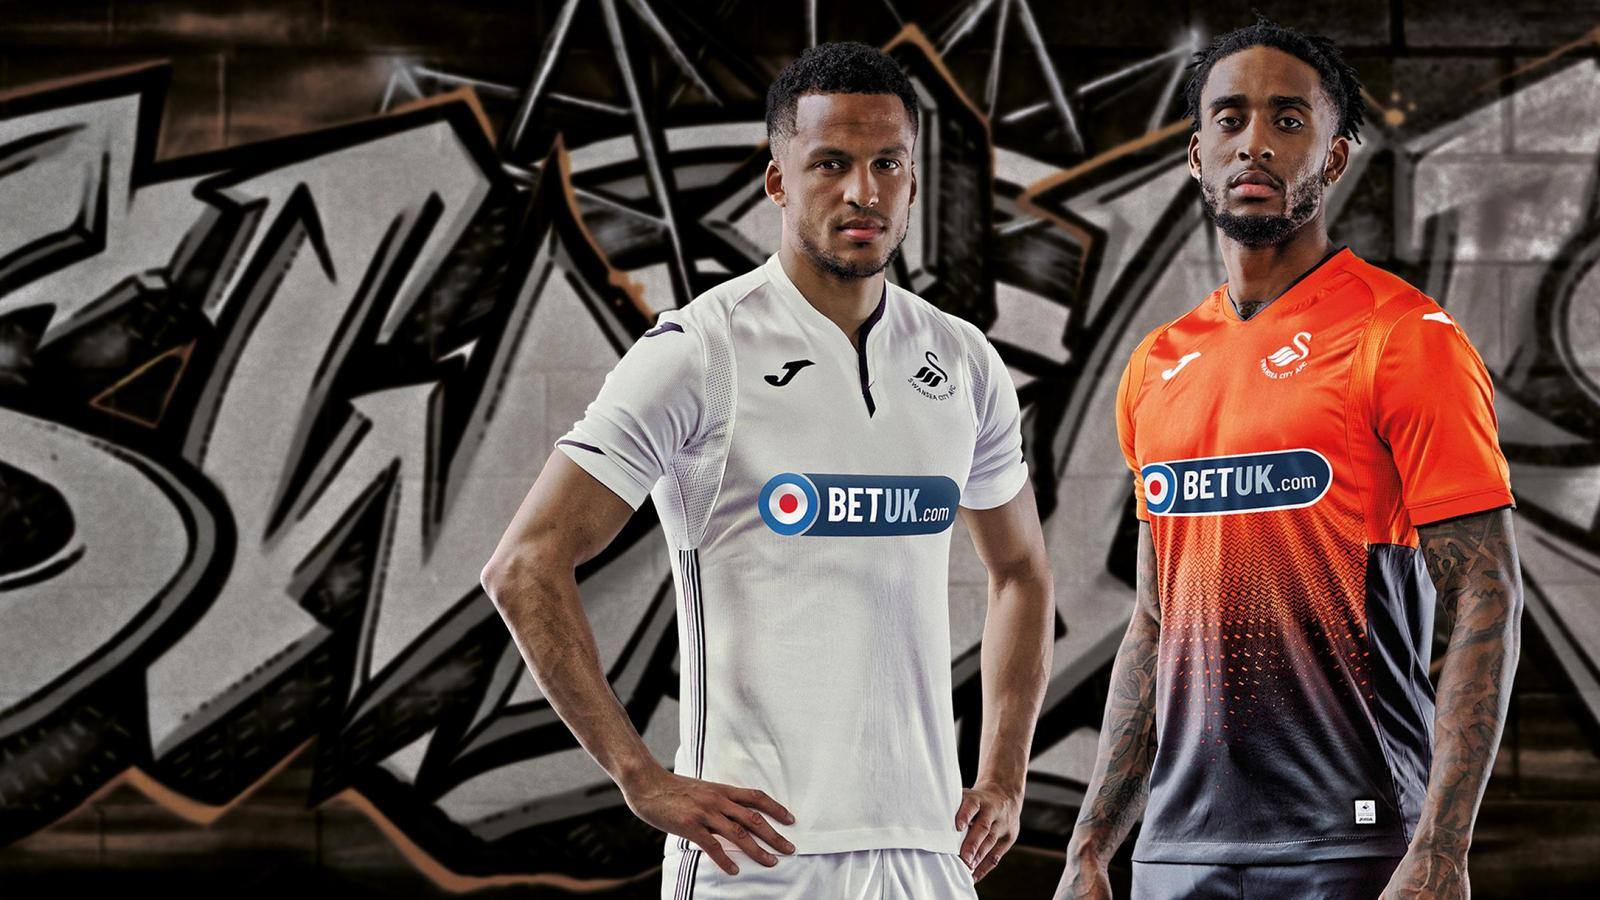 new york f2ed7 899f7 Swansea City 18-19 Home & Away Kits Revealed - Footy Headlines